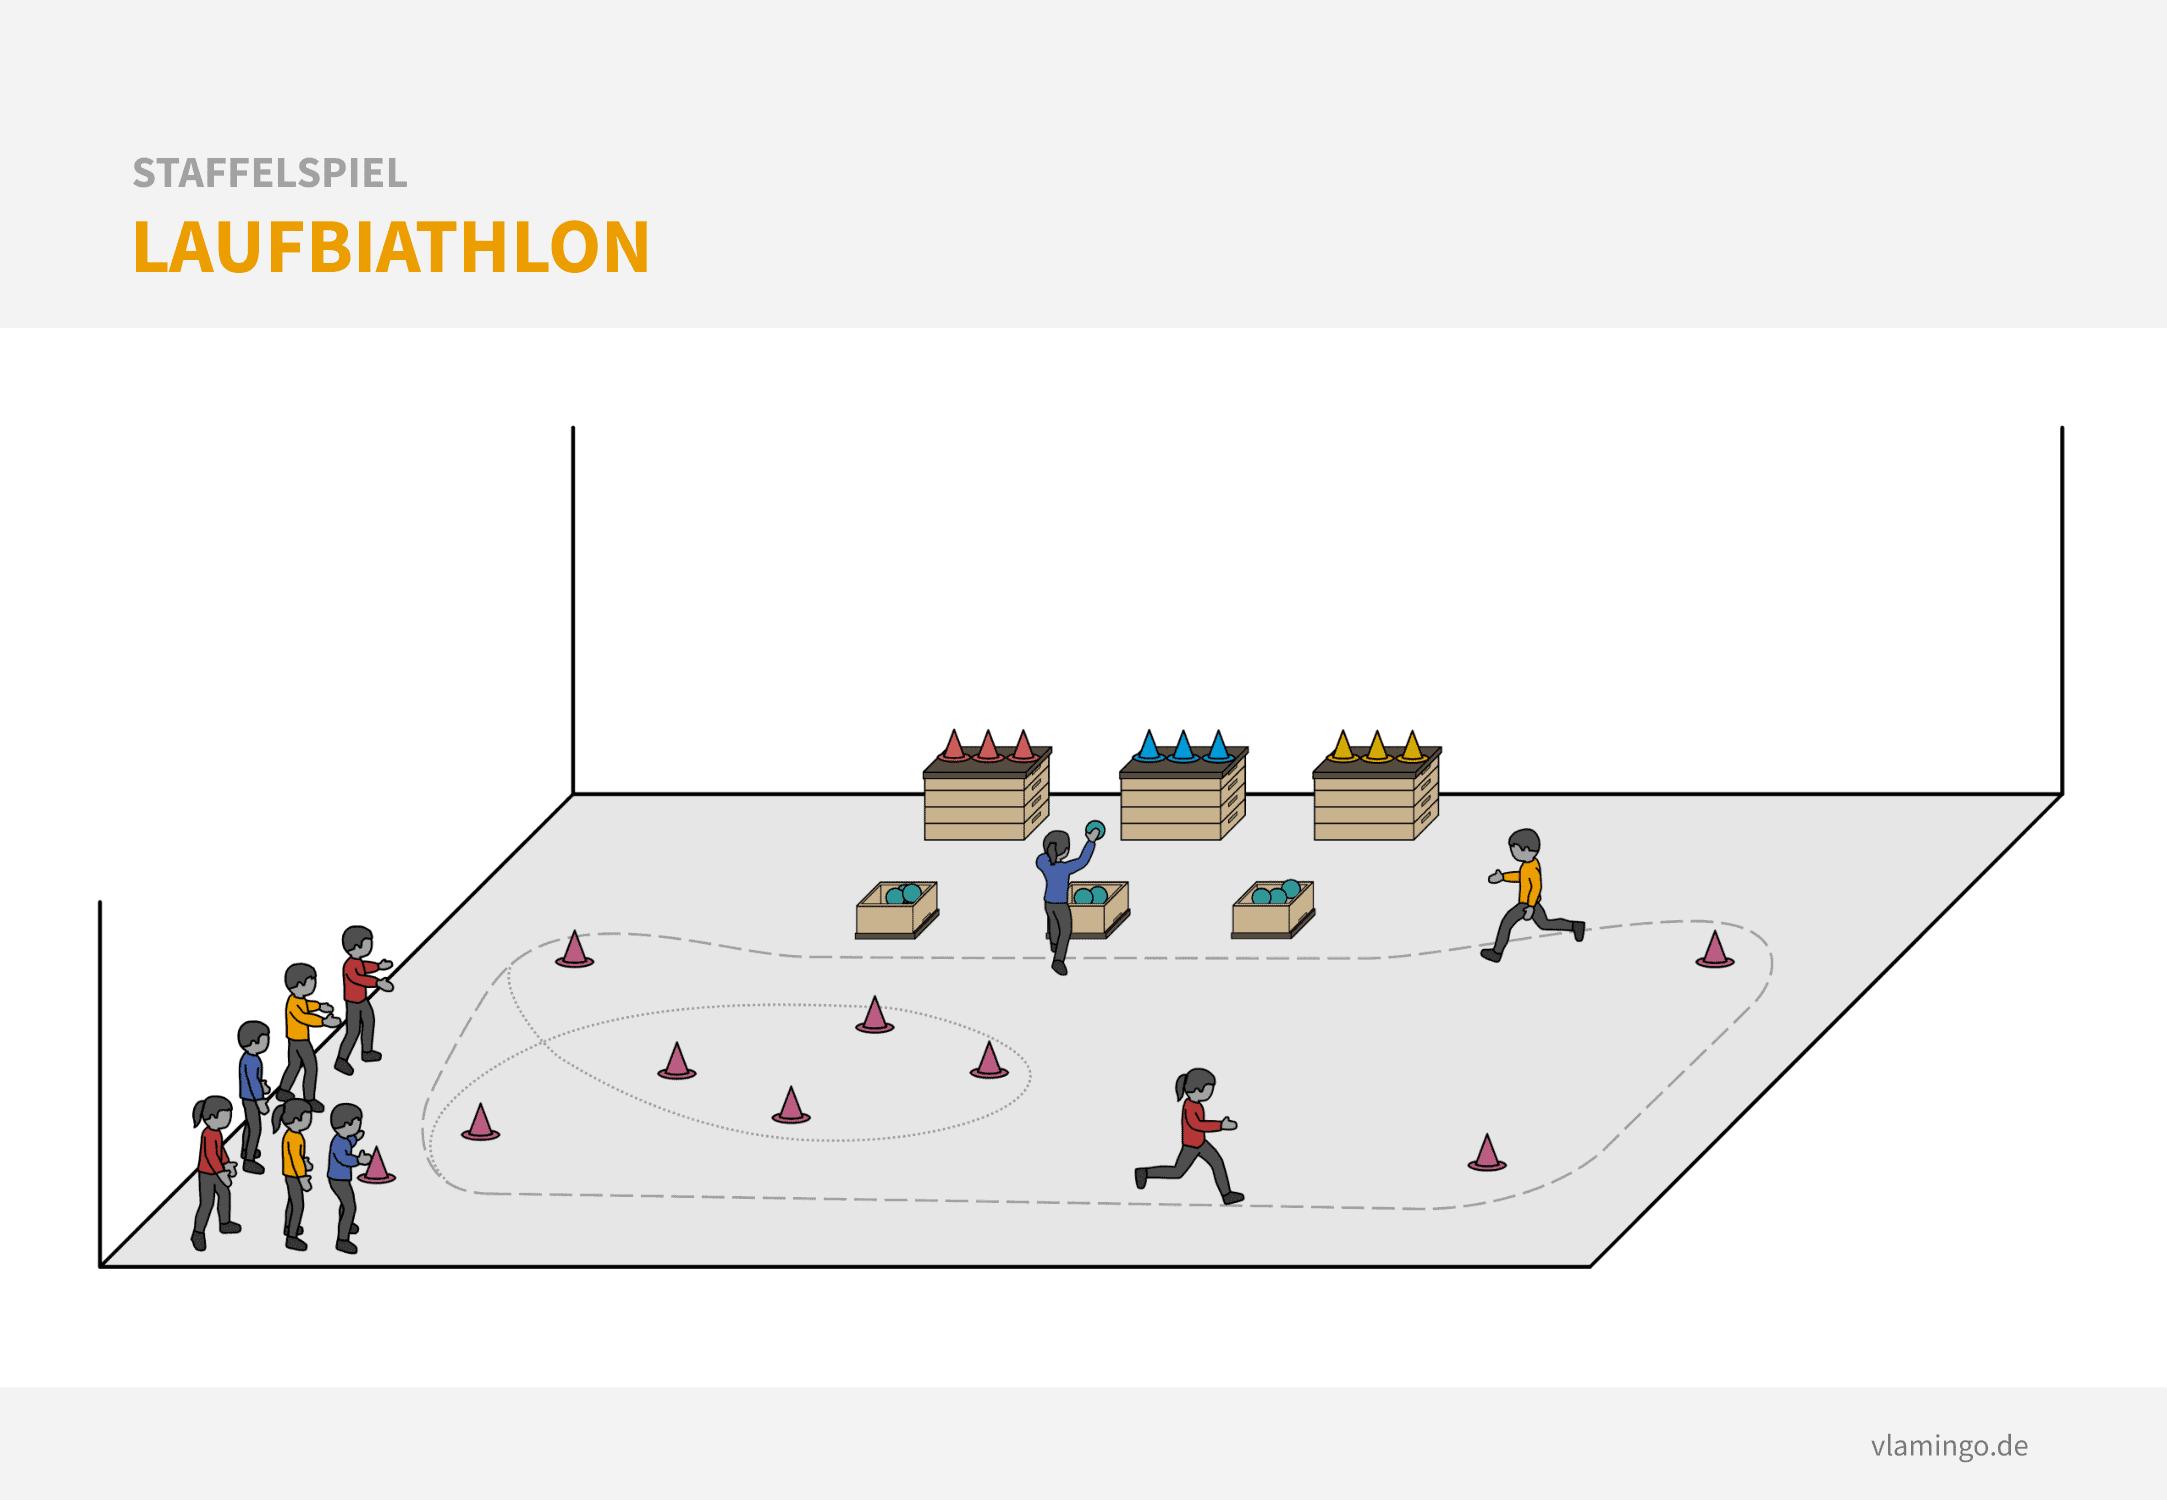 Staffelspiel - Laufbiathlon